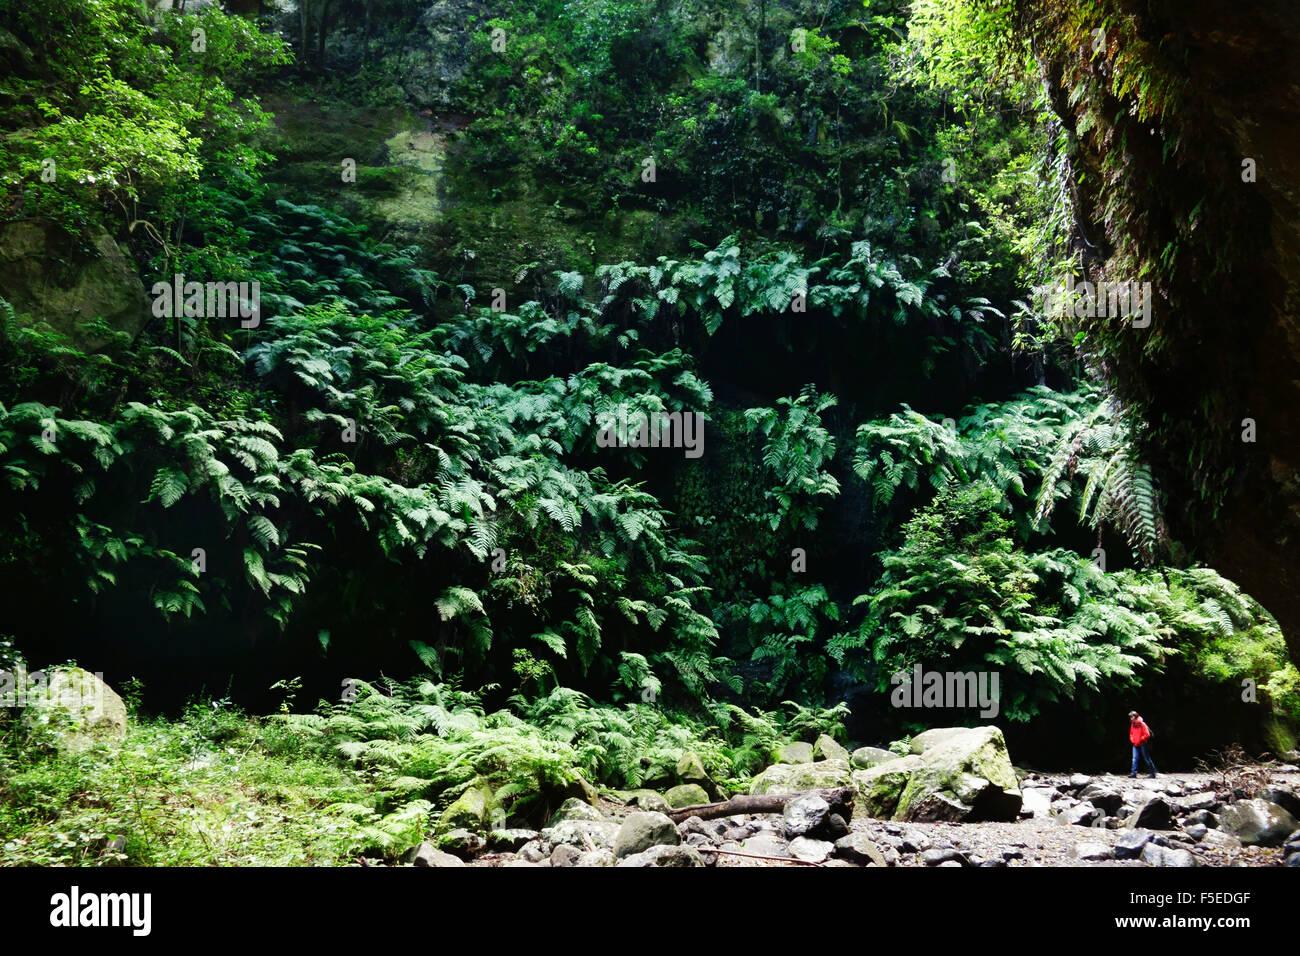 Laurel forest, Los Tilos Biosphere Reserve, La Palma, Canary Islands, Spain, Europe - Stock Image